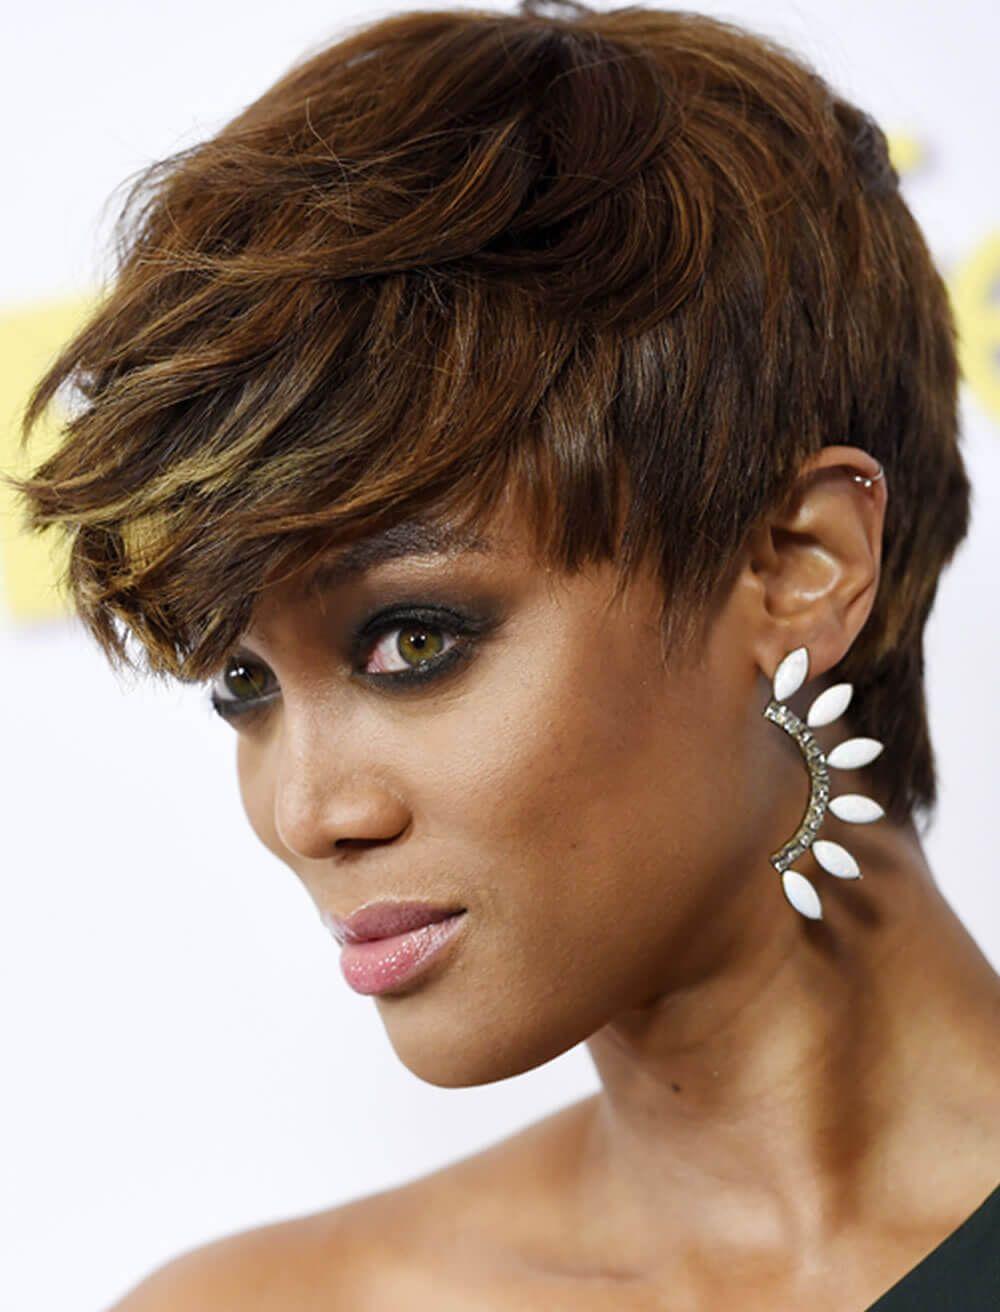 Braune kurzhaarfrisuren kurze frisuren pinterest hair black